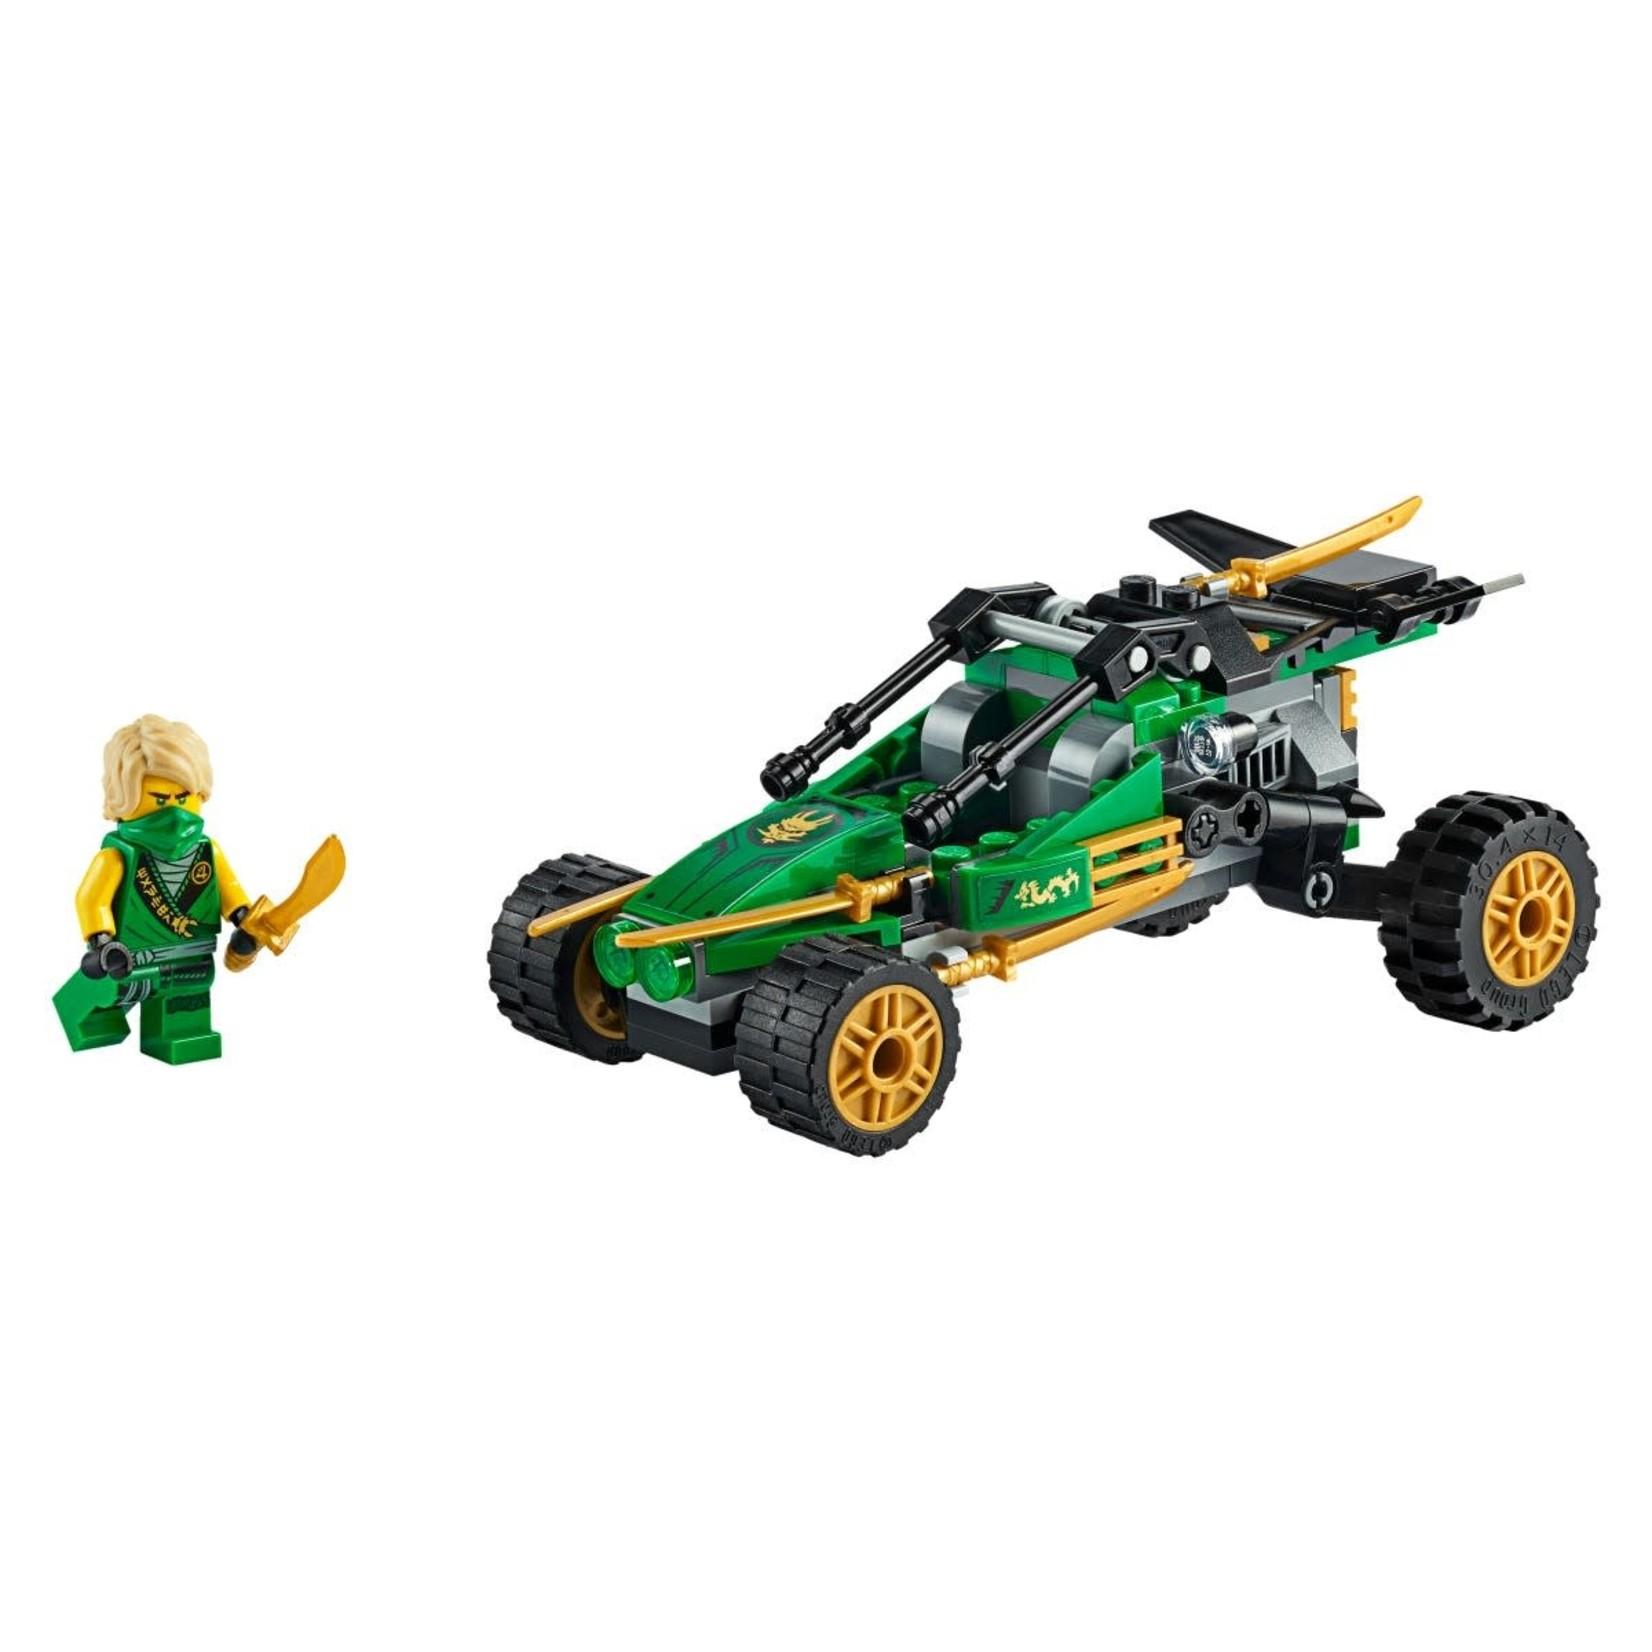 LEGO LEGO Ninjago Jungle Raider